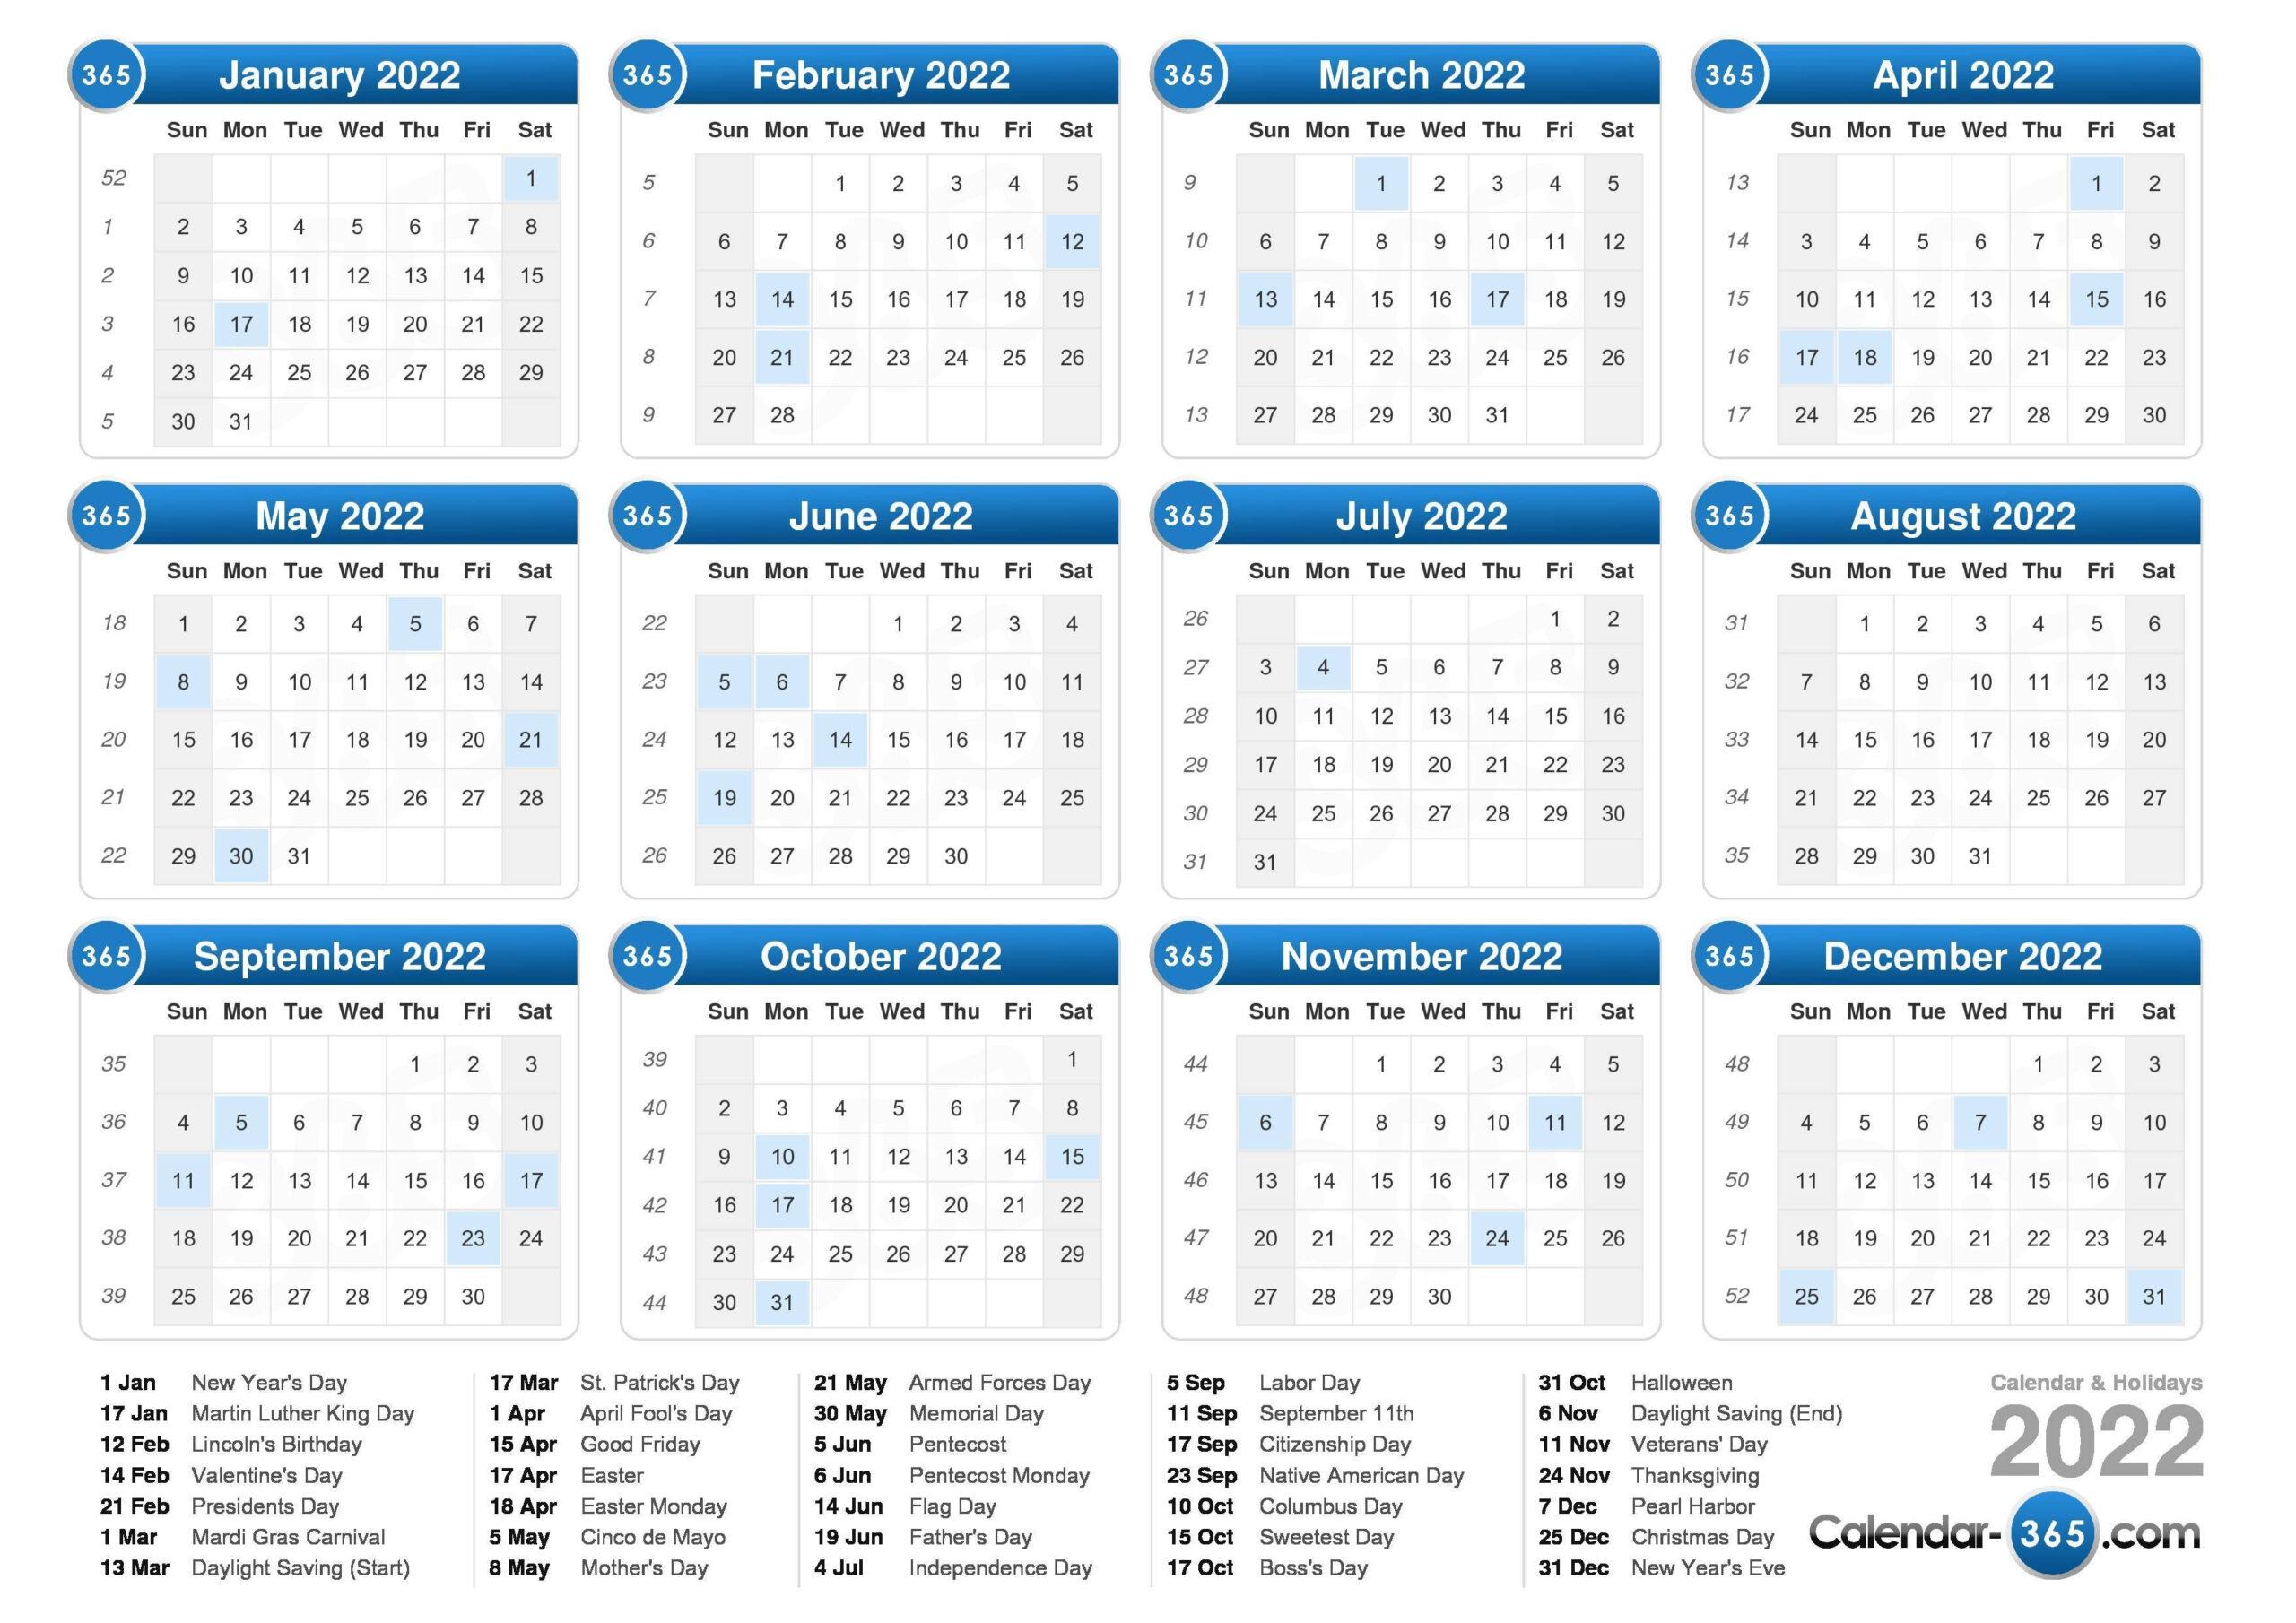 2022 Calendar throughout Print July 2022 Ckander